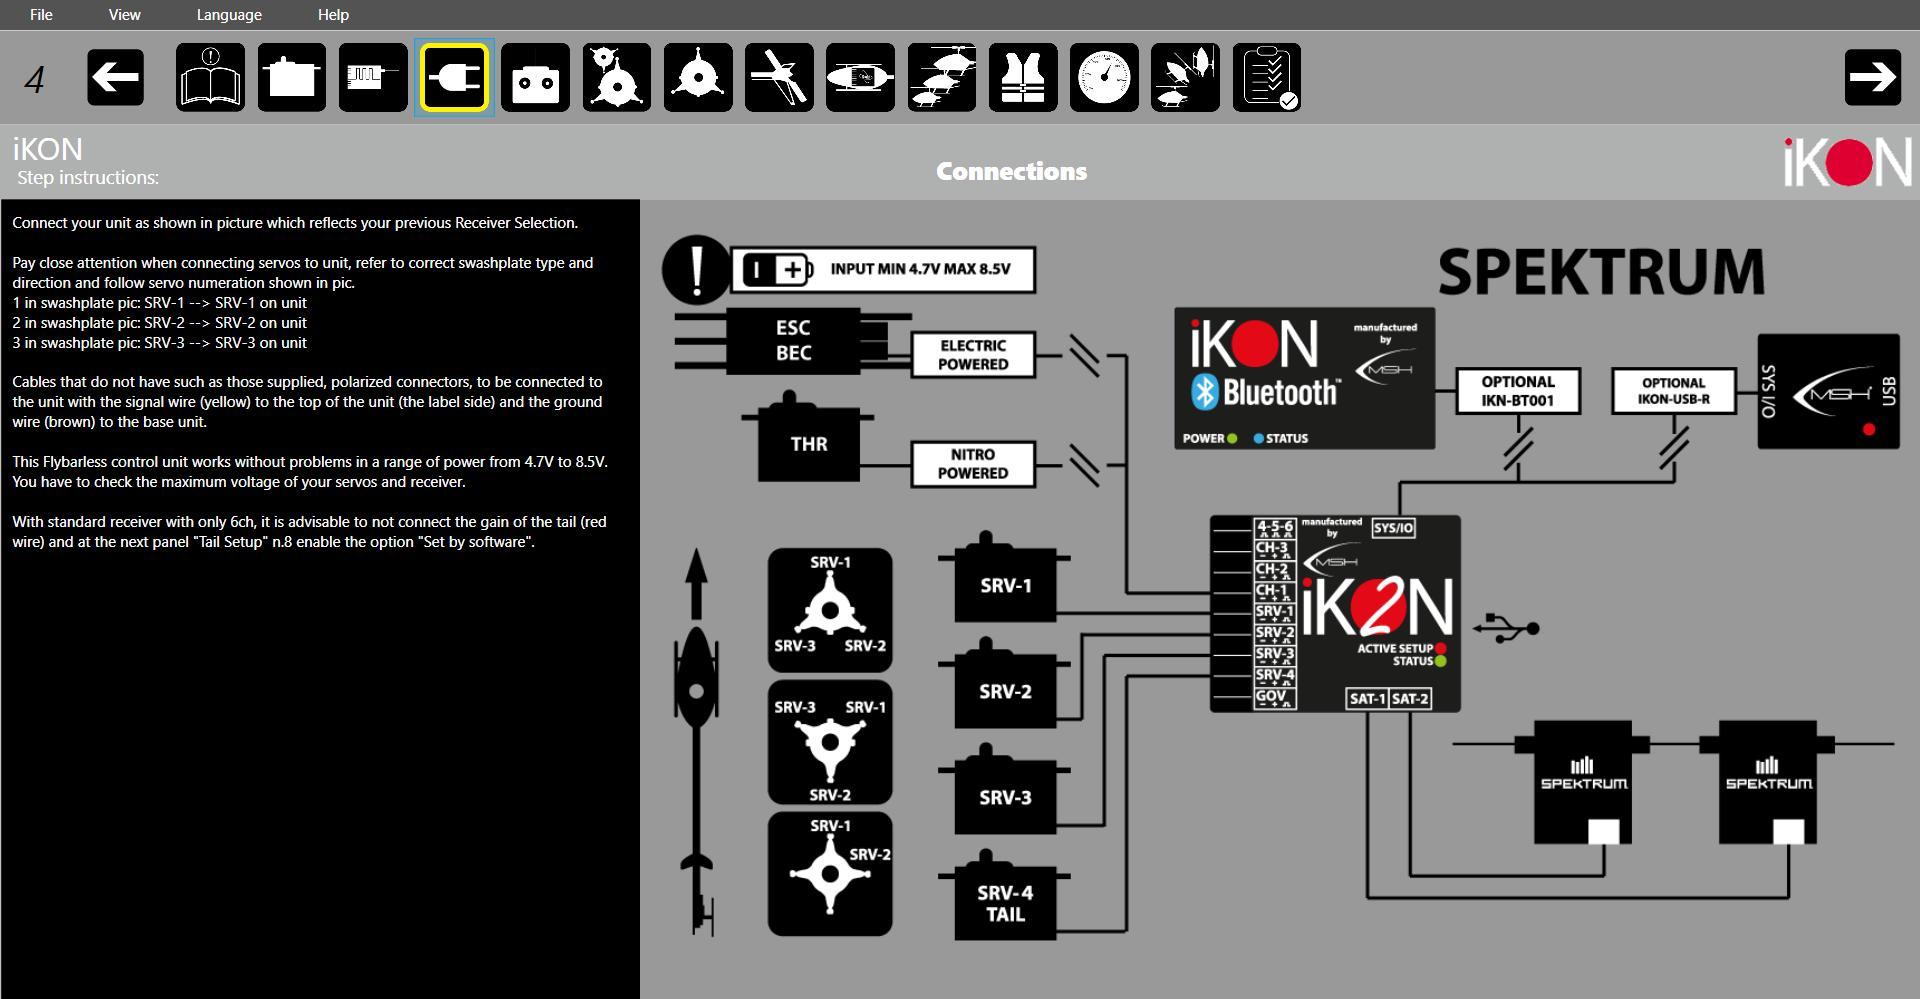 pc-software-menu-gui-all-ikon-.jpg